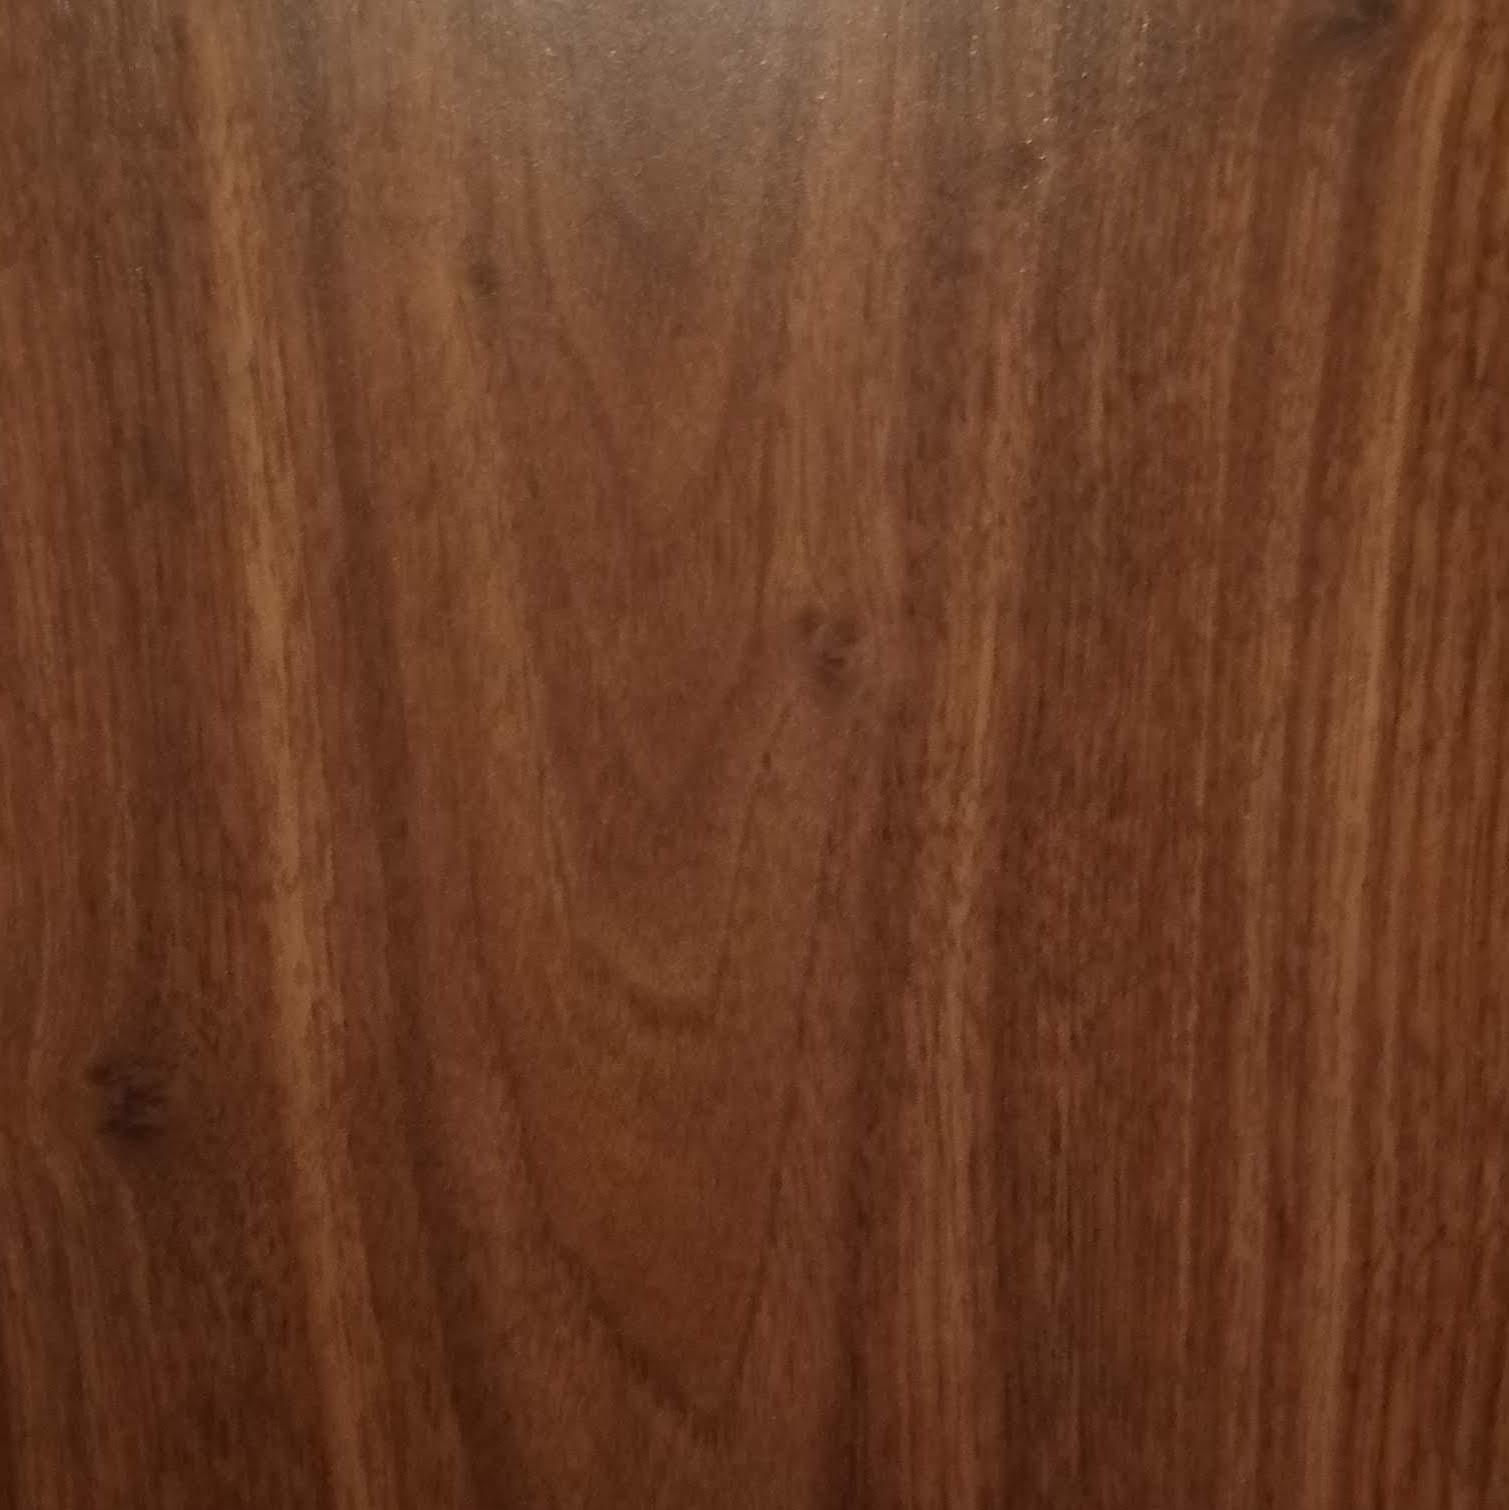 Oiled Walnut 1043